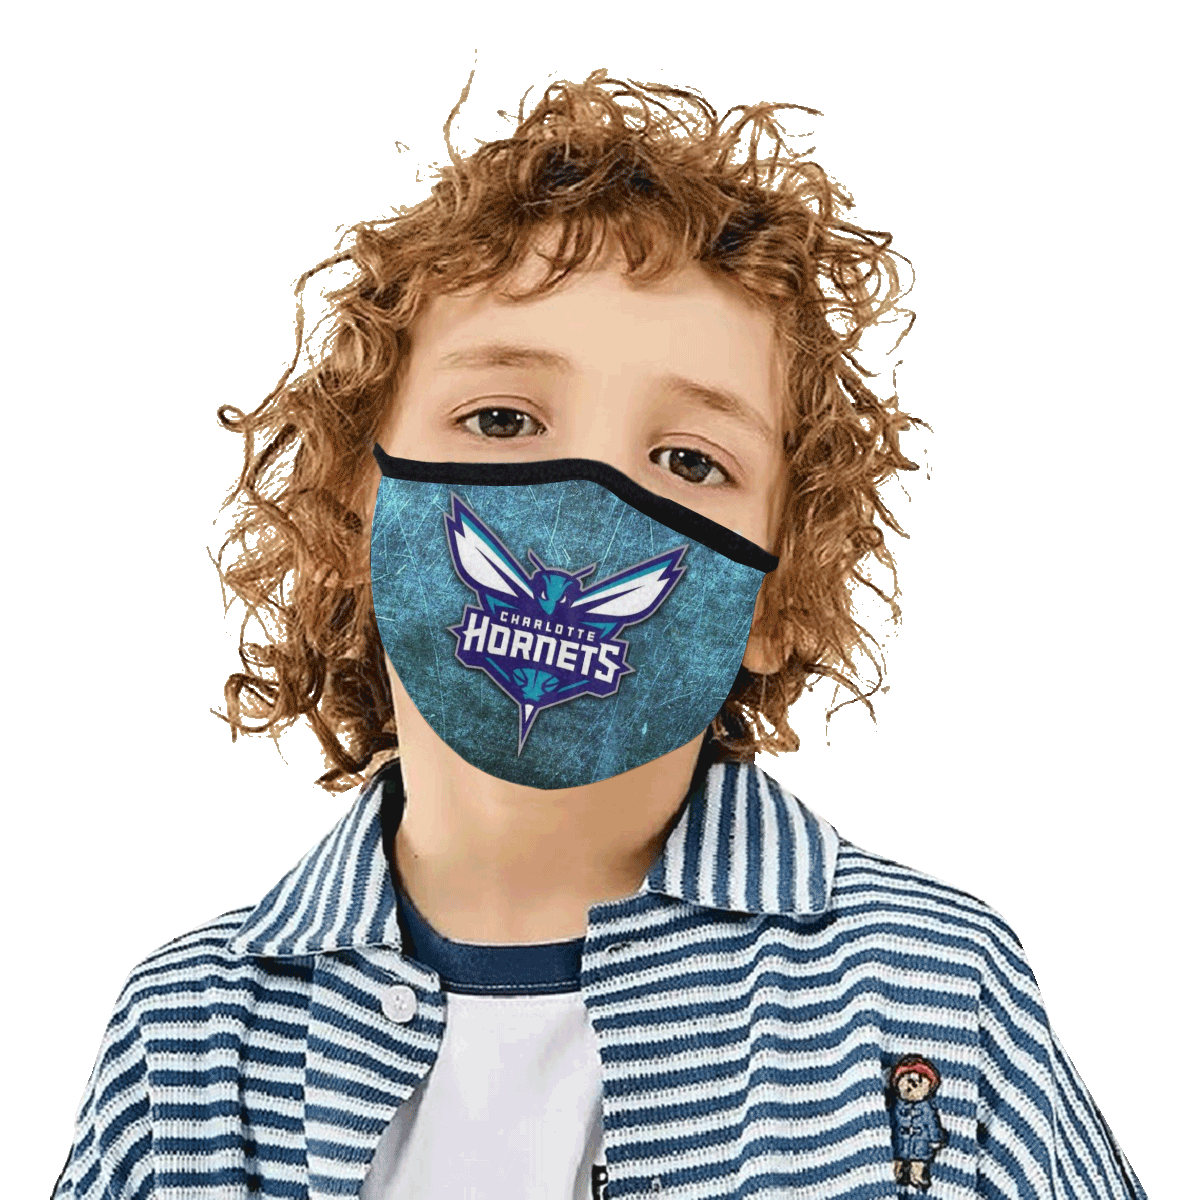 Charlotte Hornets Face Mask PM2.5